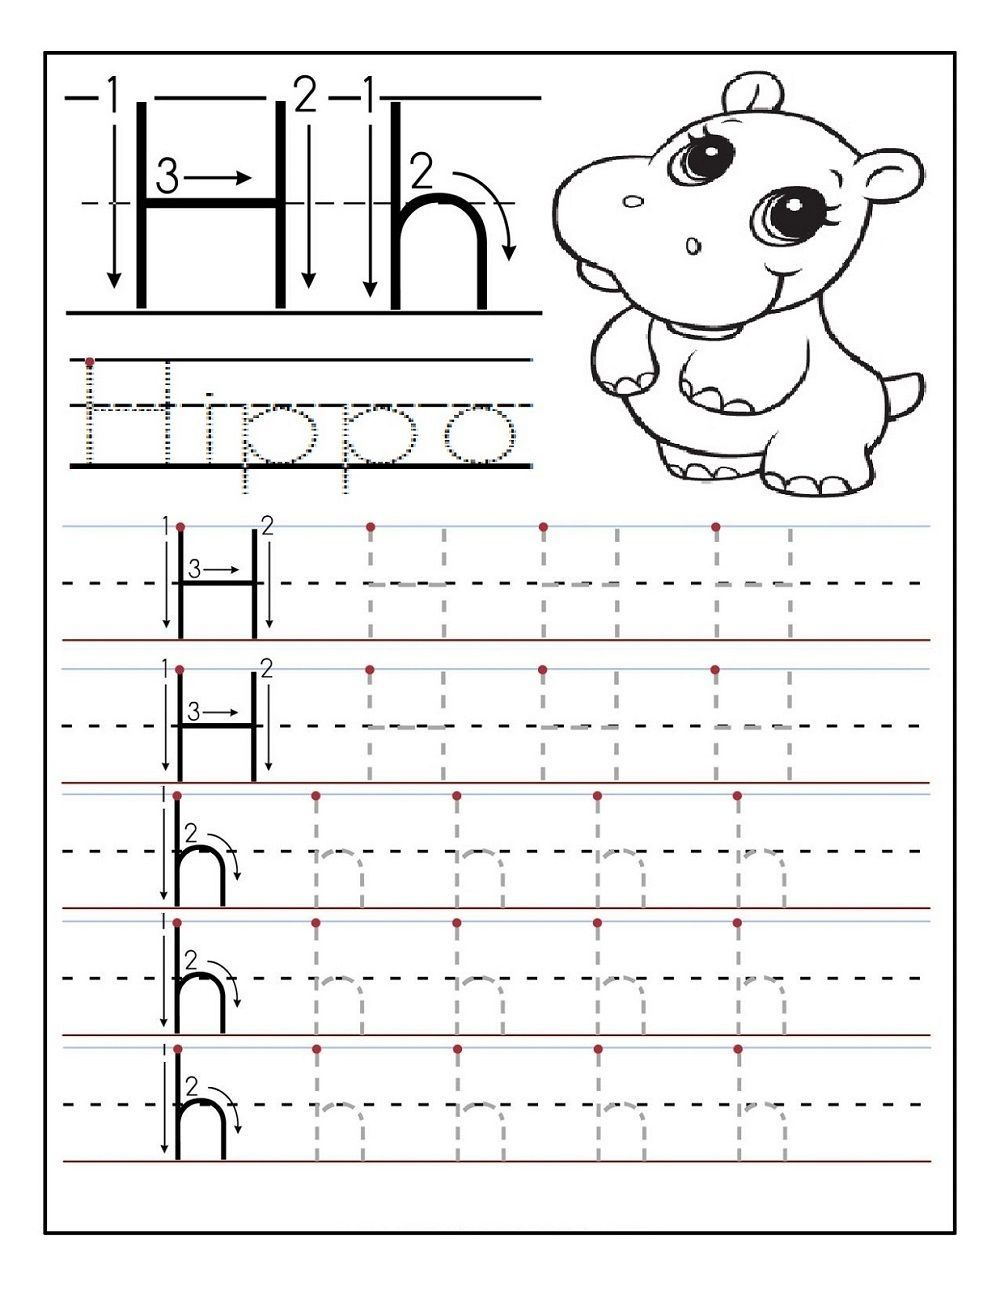 medium resolution of Tracing Worksheets 3 Year Old Fun   Tracing worksheets preschool